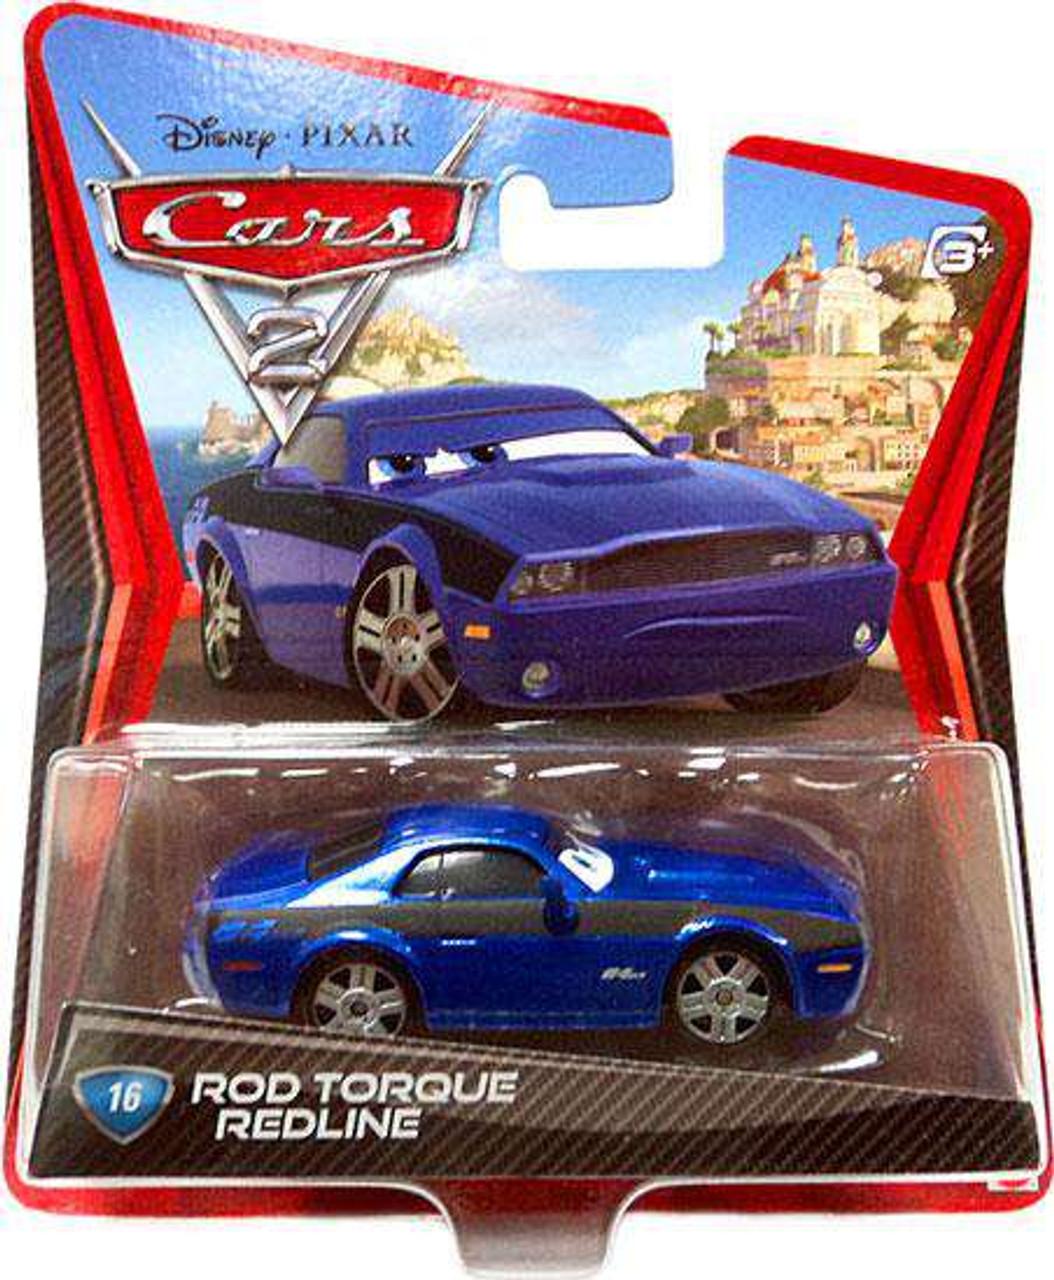 Disney Pixar Cars Cars 2 Main Series Rod Torque Redline 155